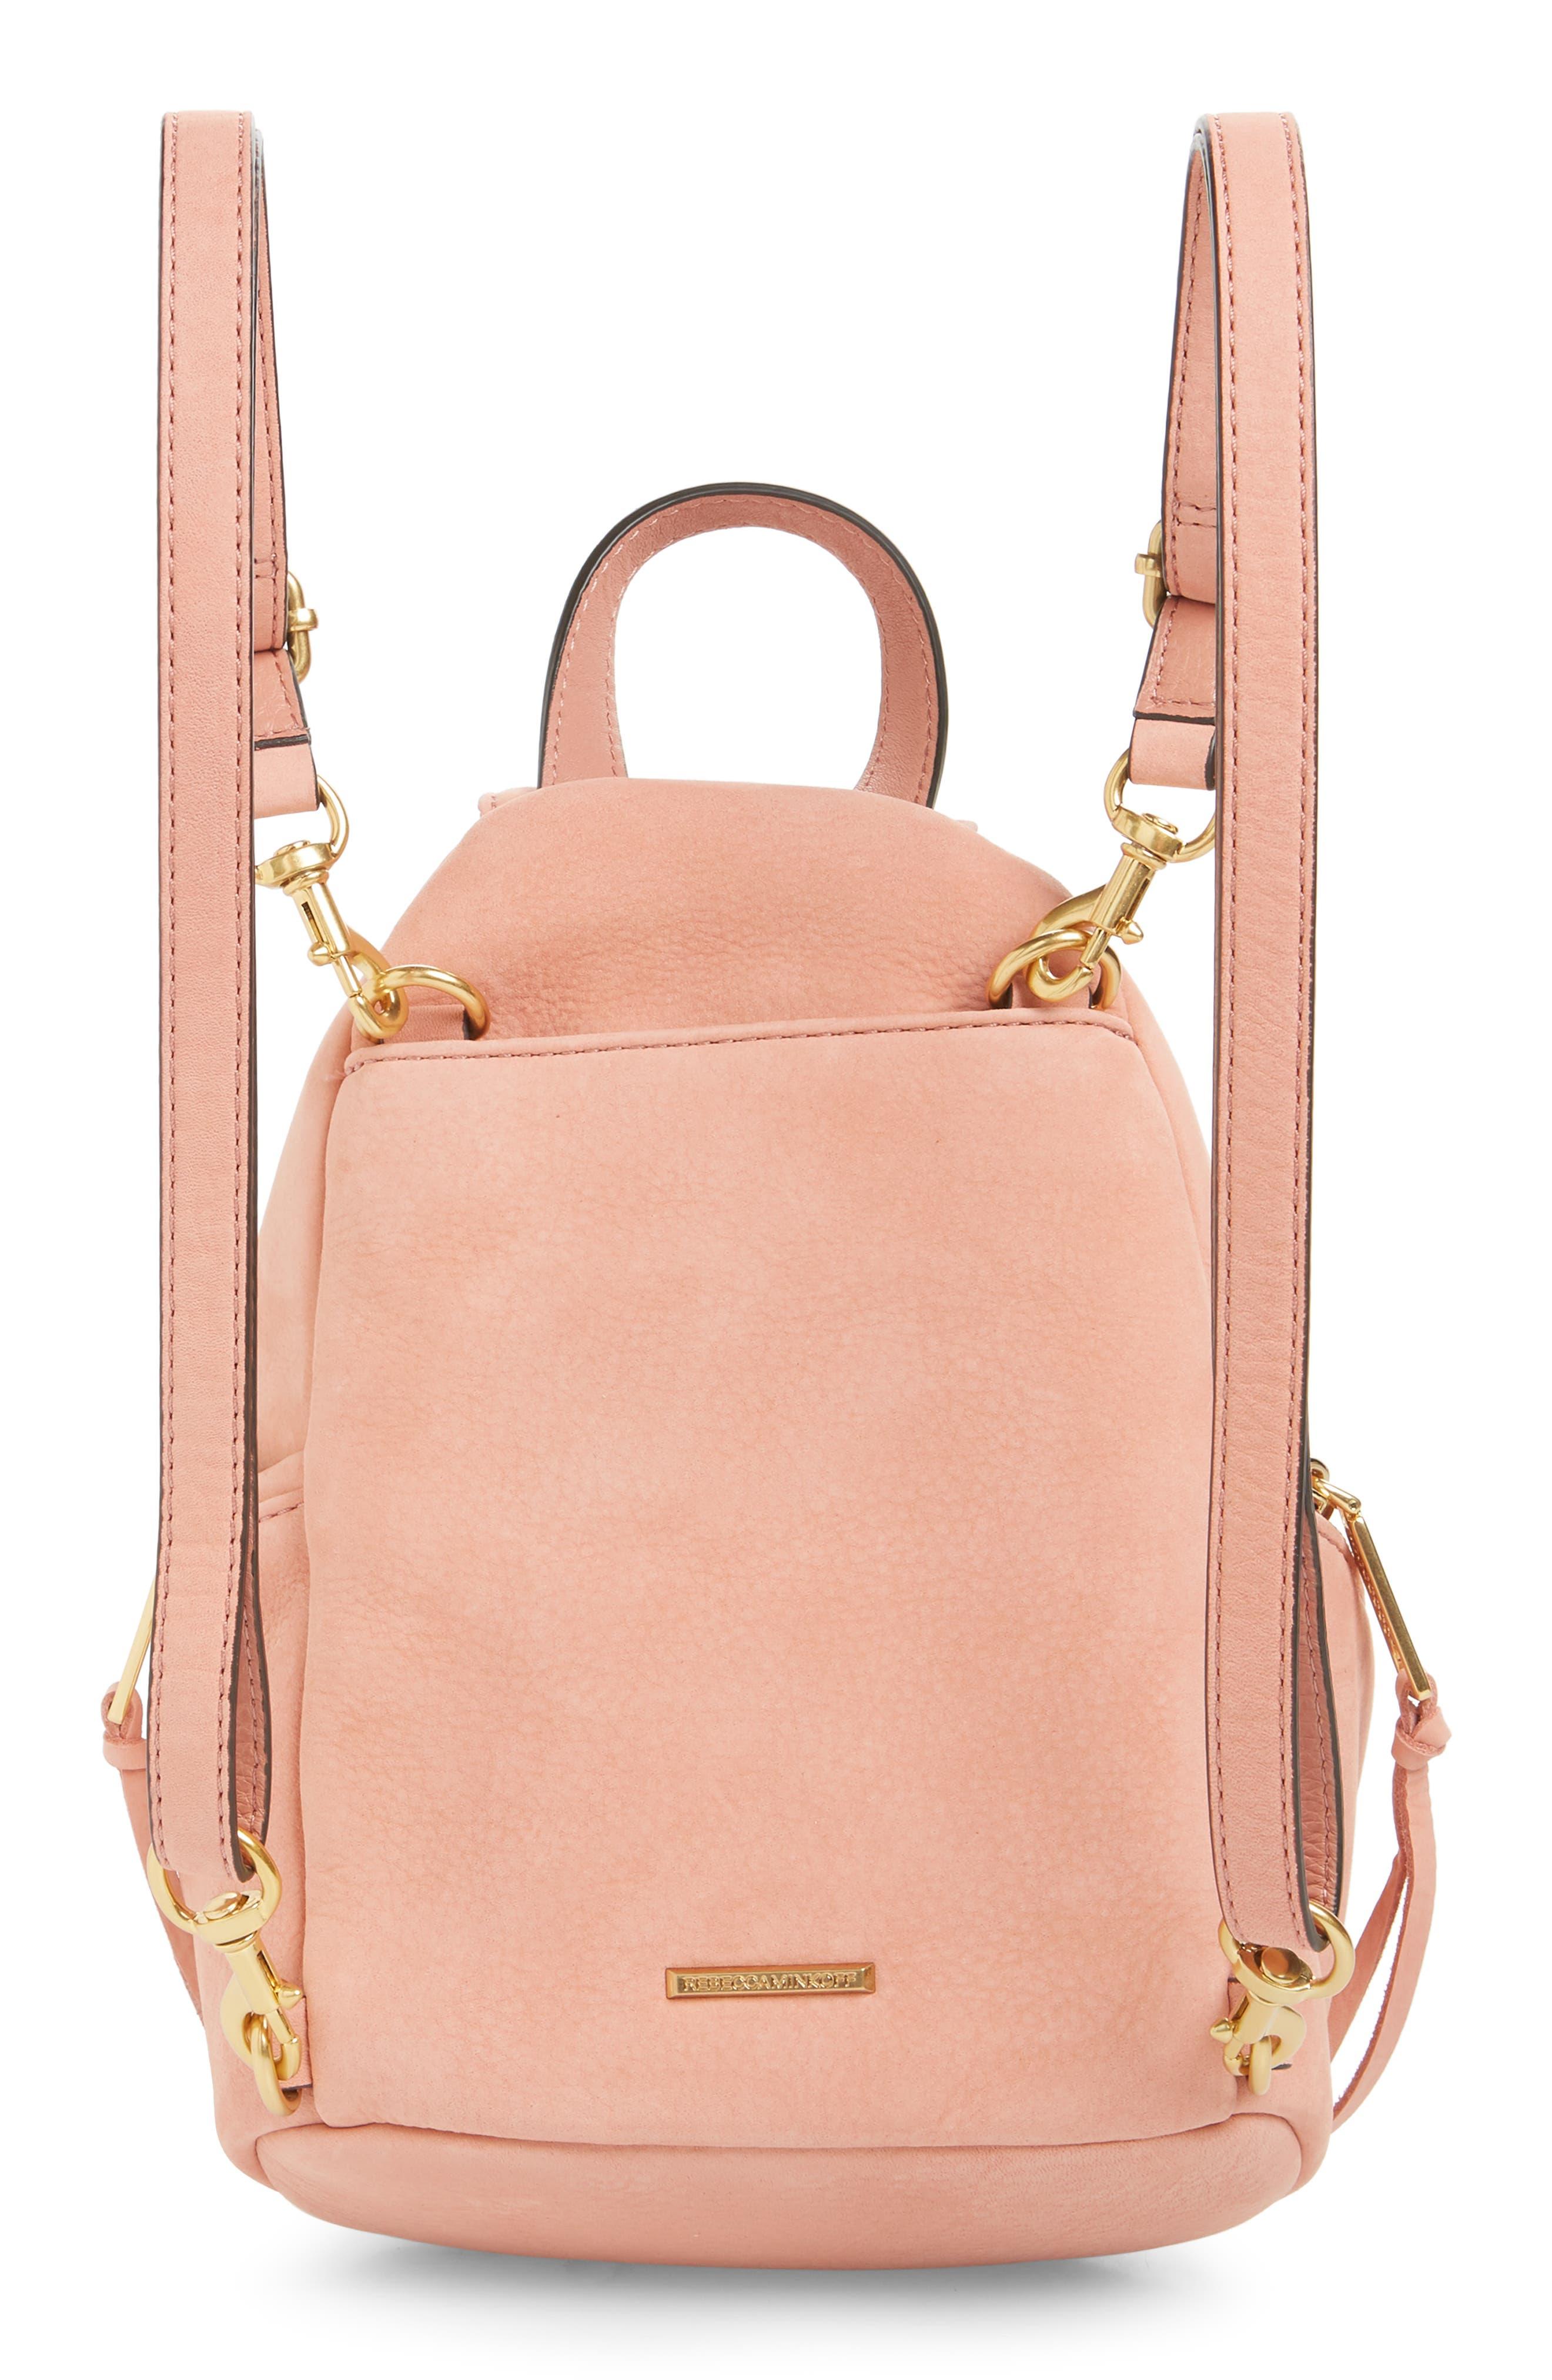 Mini Julian Nubuck Leather Convertible Backpack,                             Alternate thumbnail 3, color,                             DUSTY PEACH